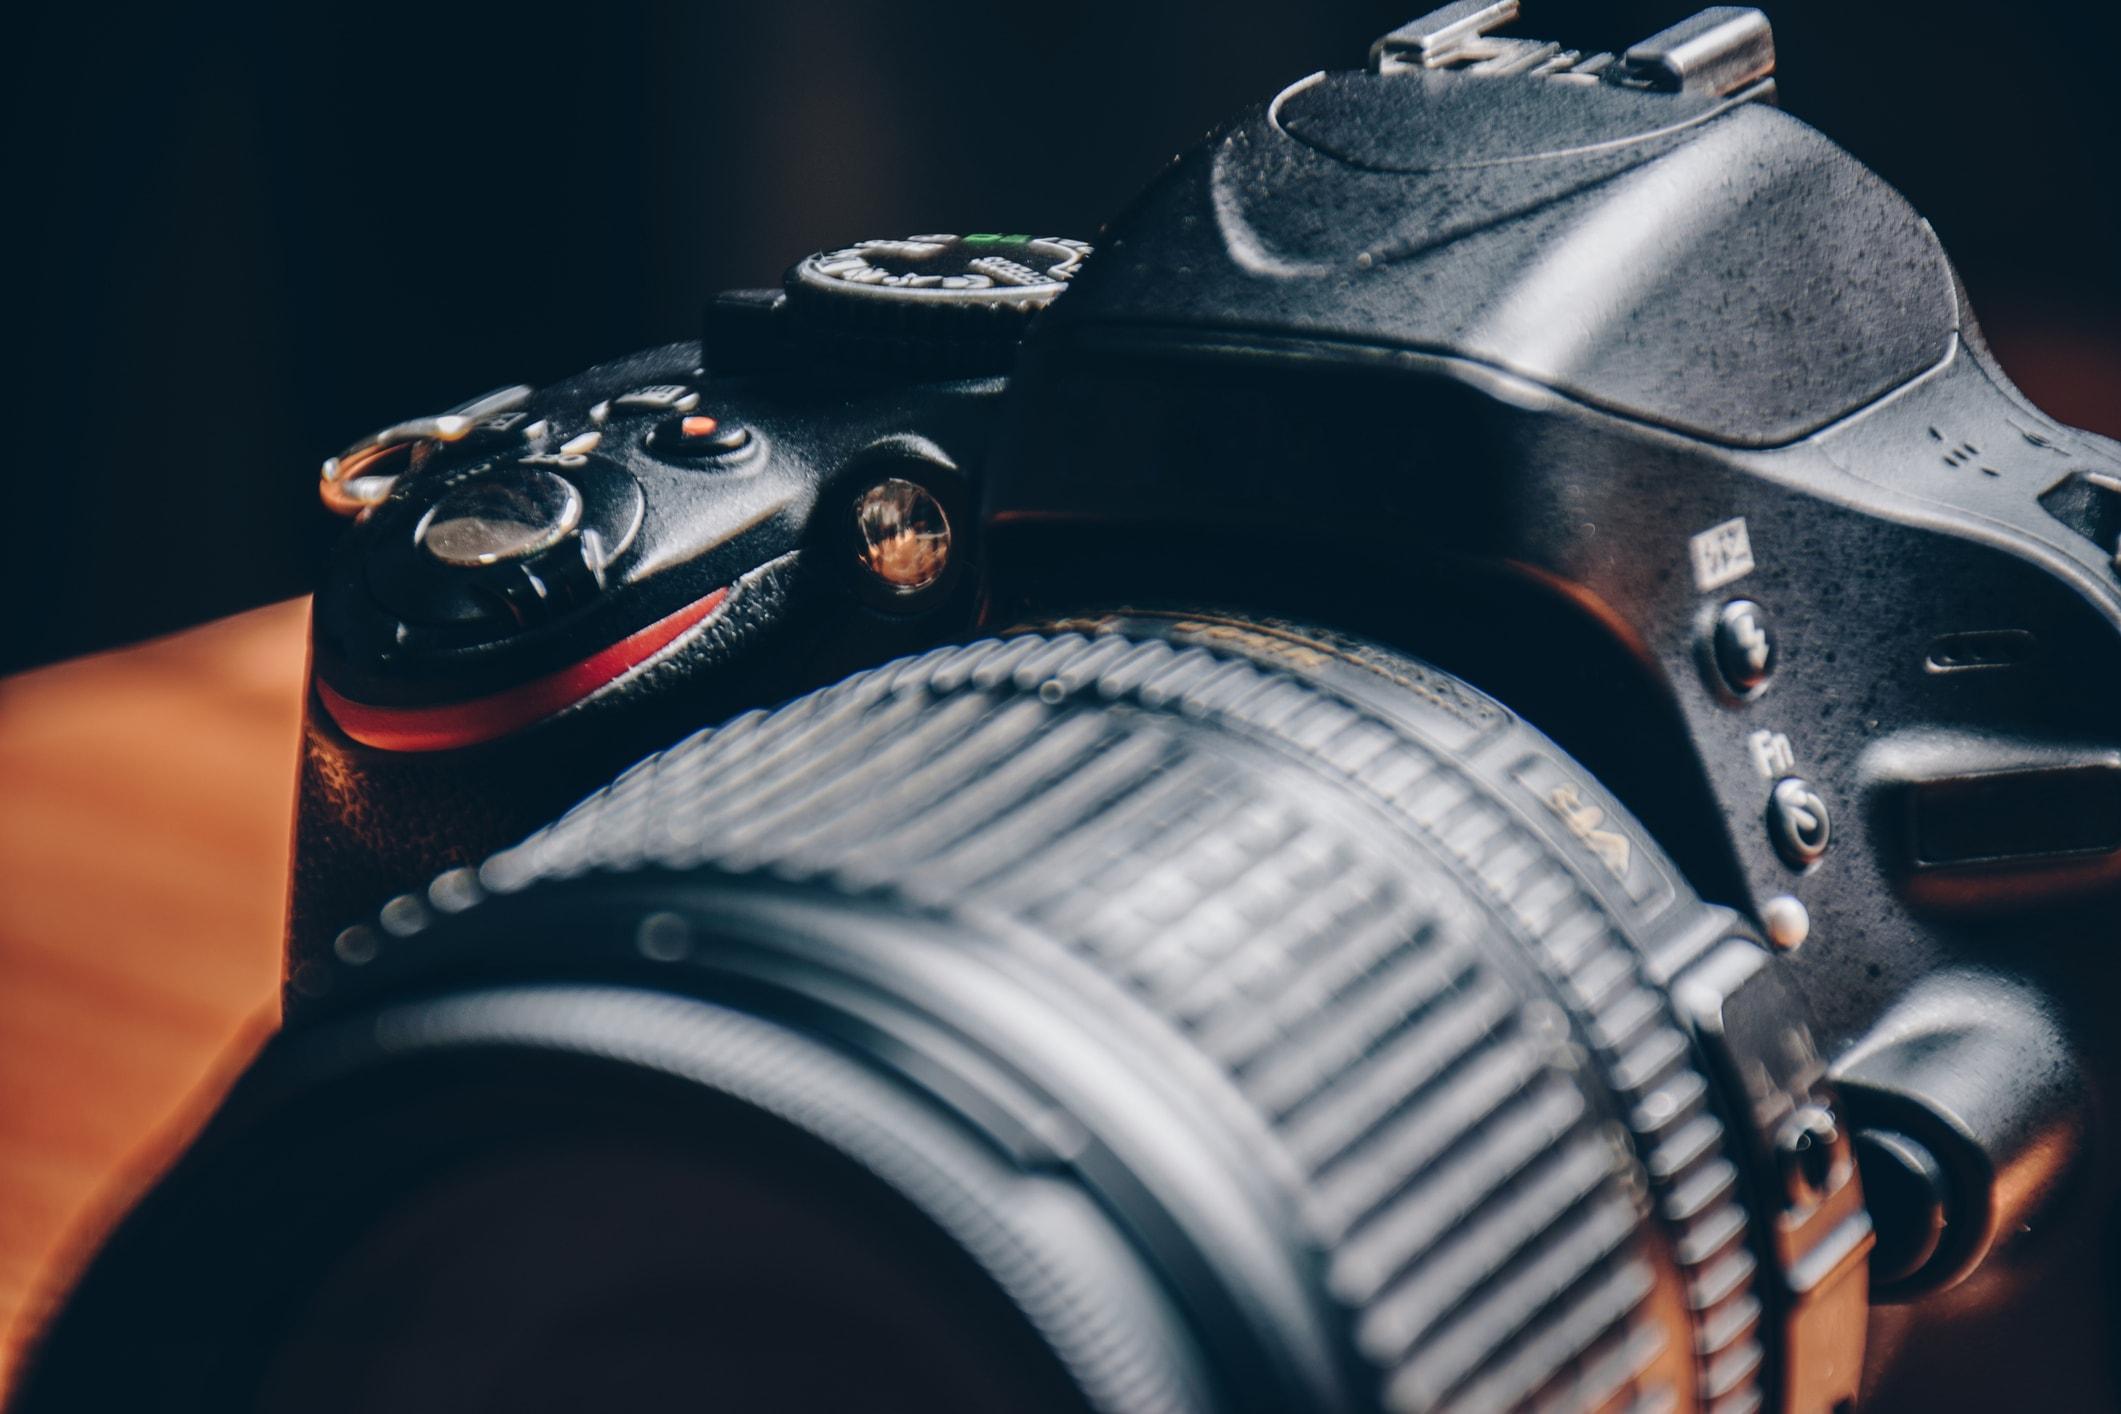 canon mirrorless camera image